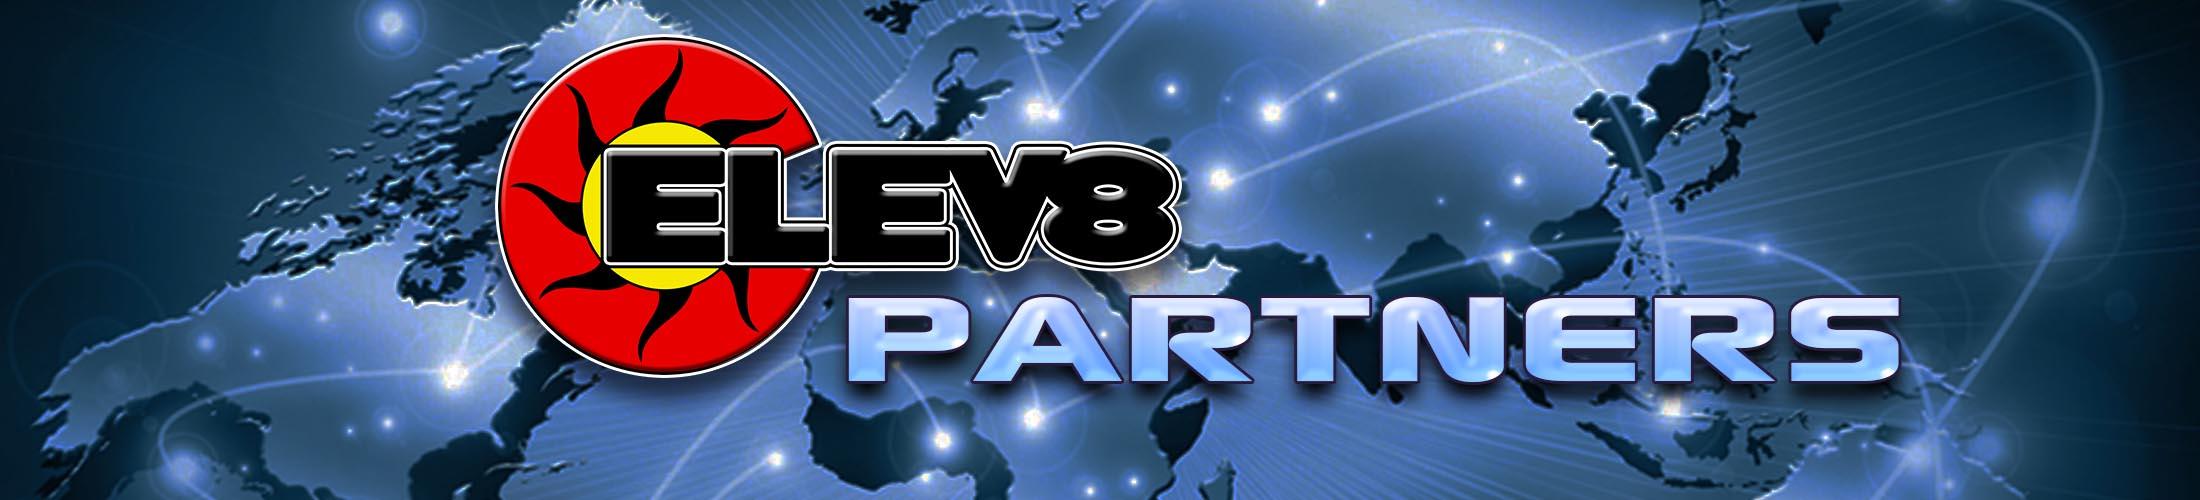 elev8-partners-main-banner.jpg